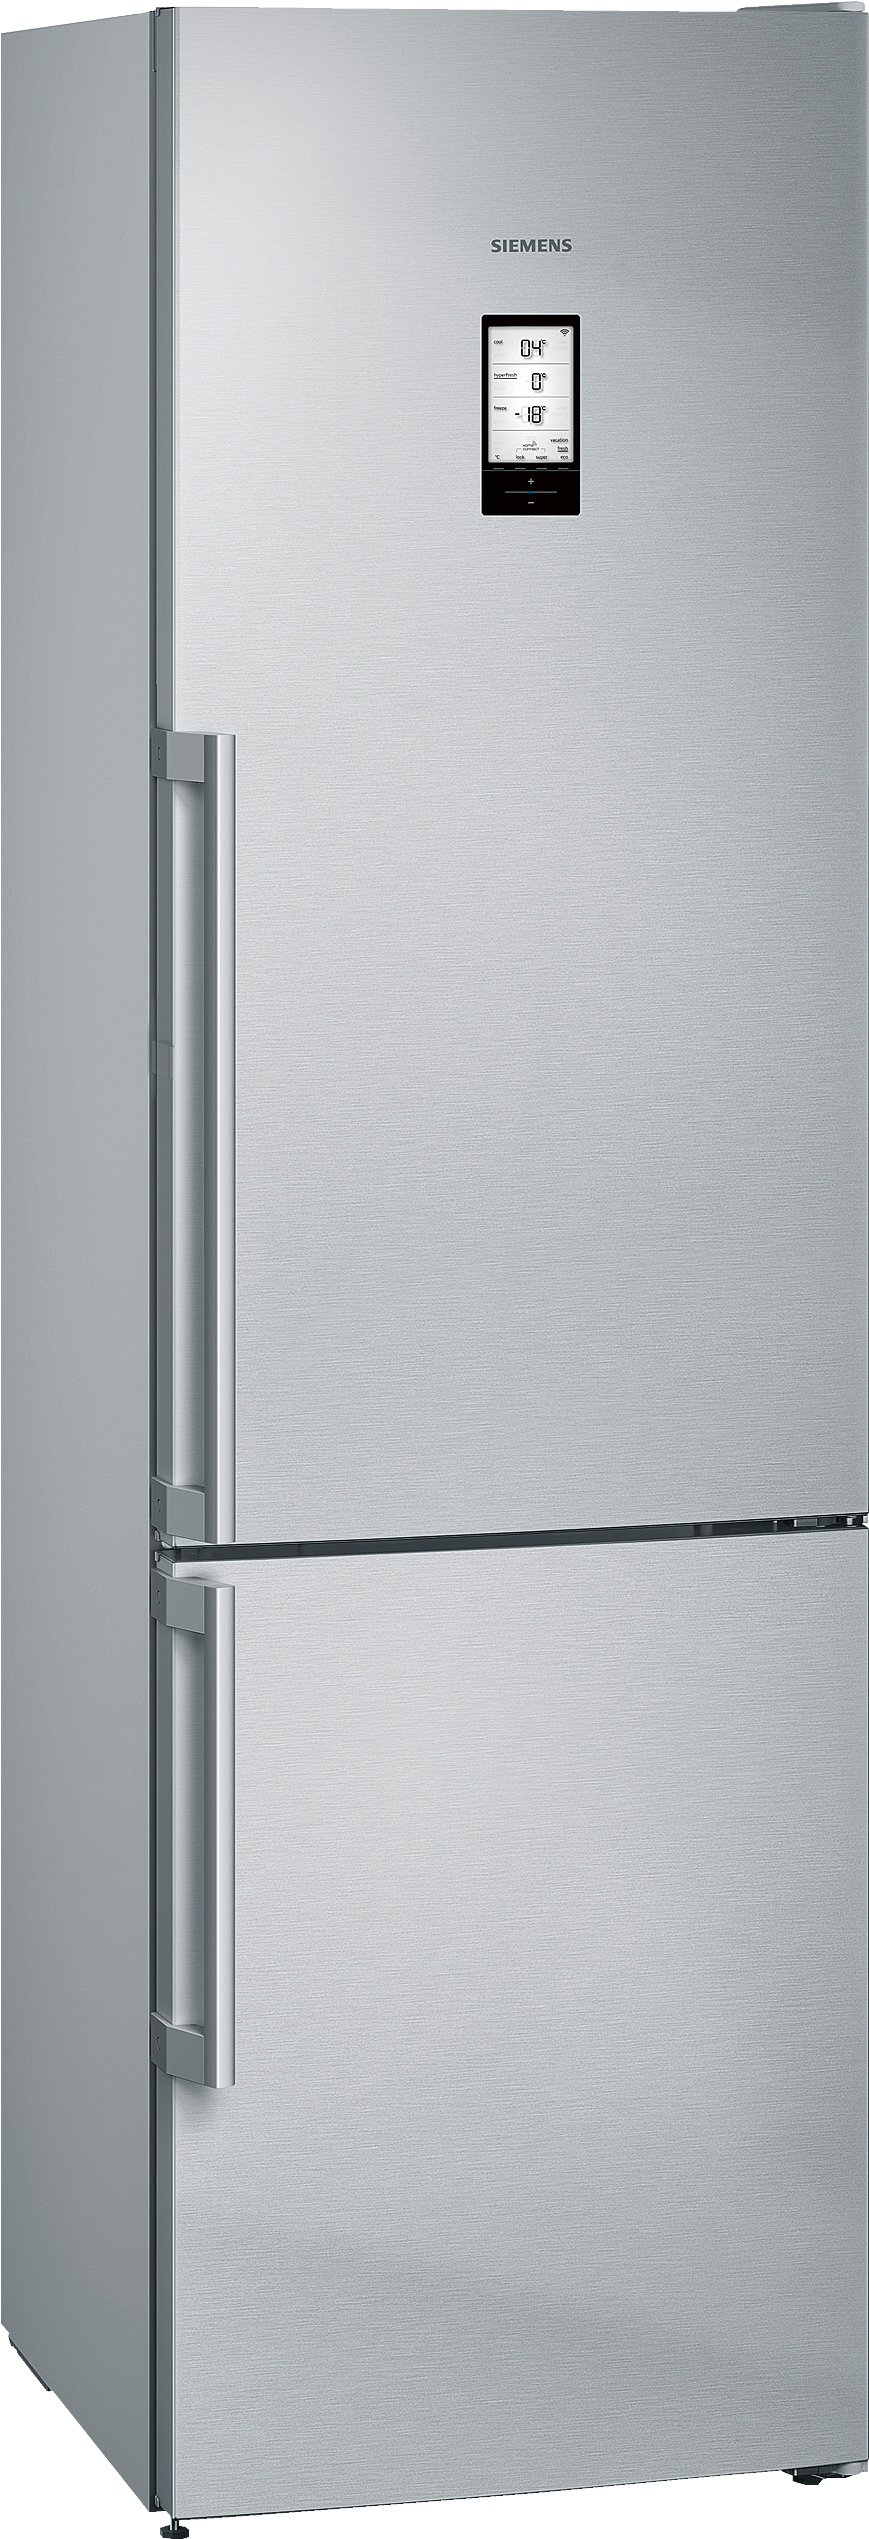 siemens fridge freezer manual instructions